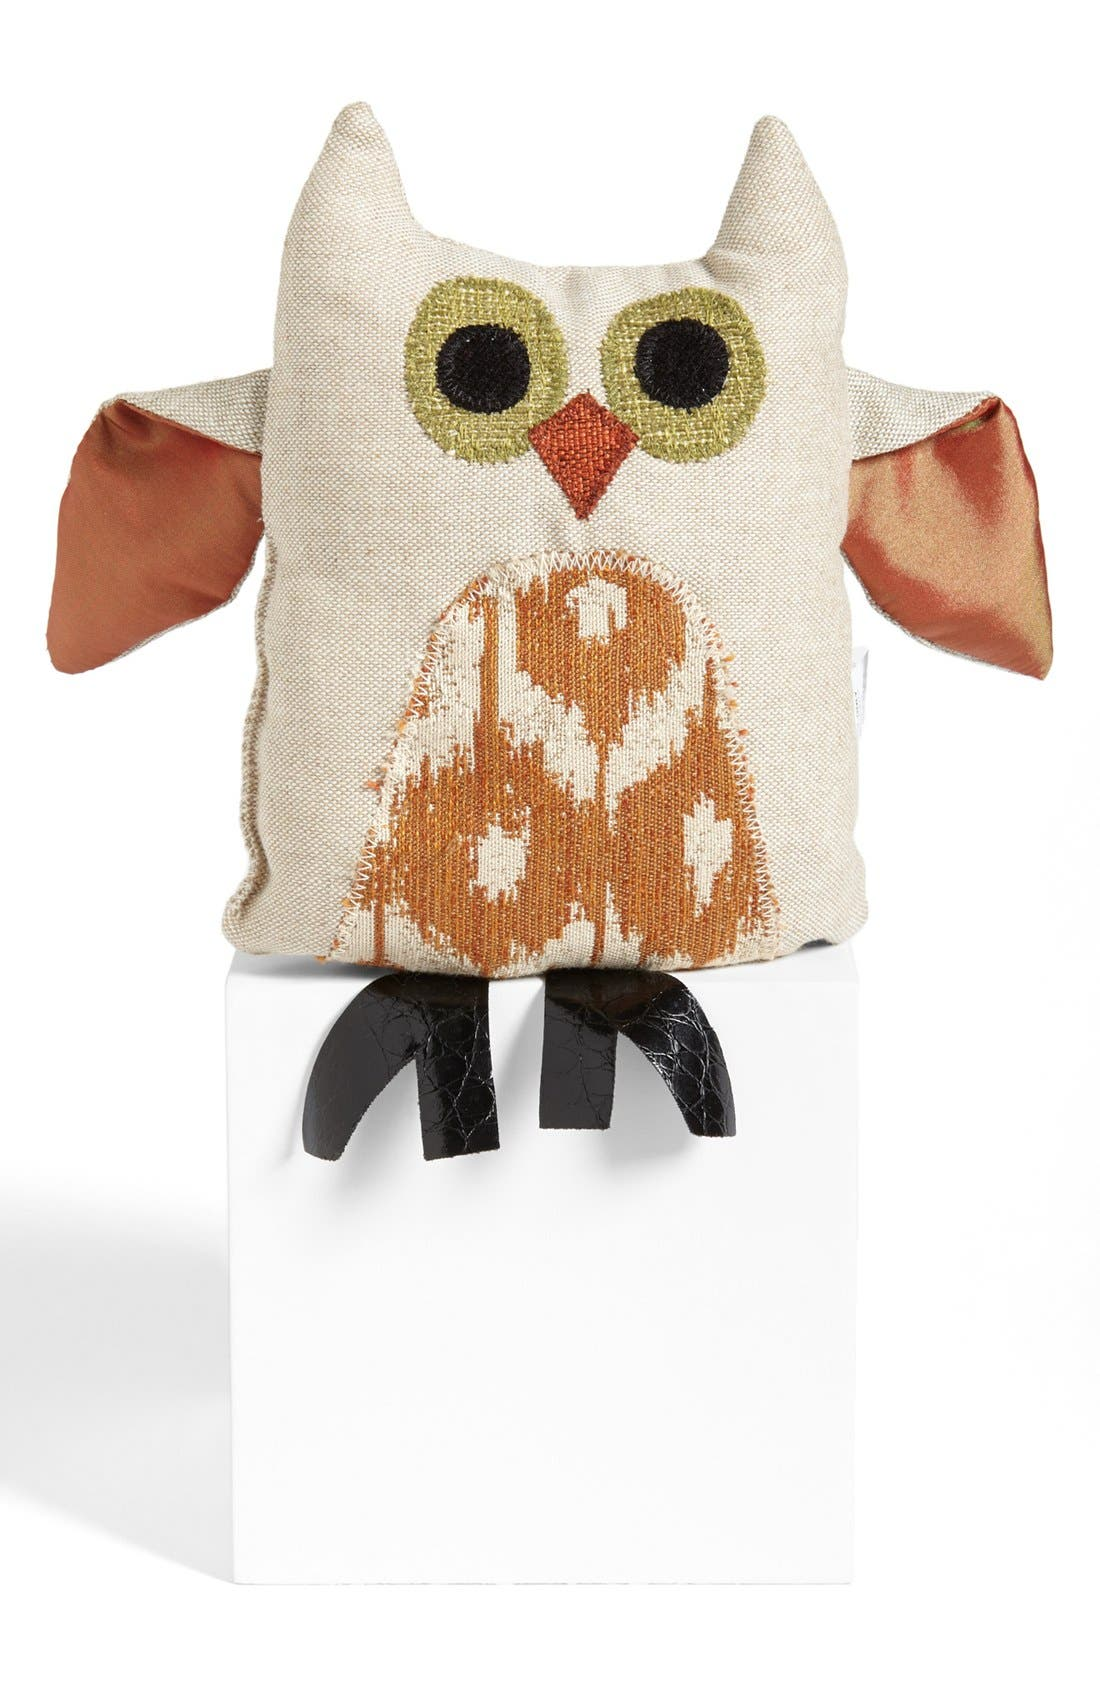 Alternate Image 1 Selected - Woof & Poof Inc. 'Ambrosia' Owl Bean Bag